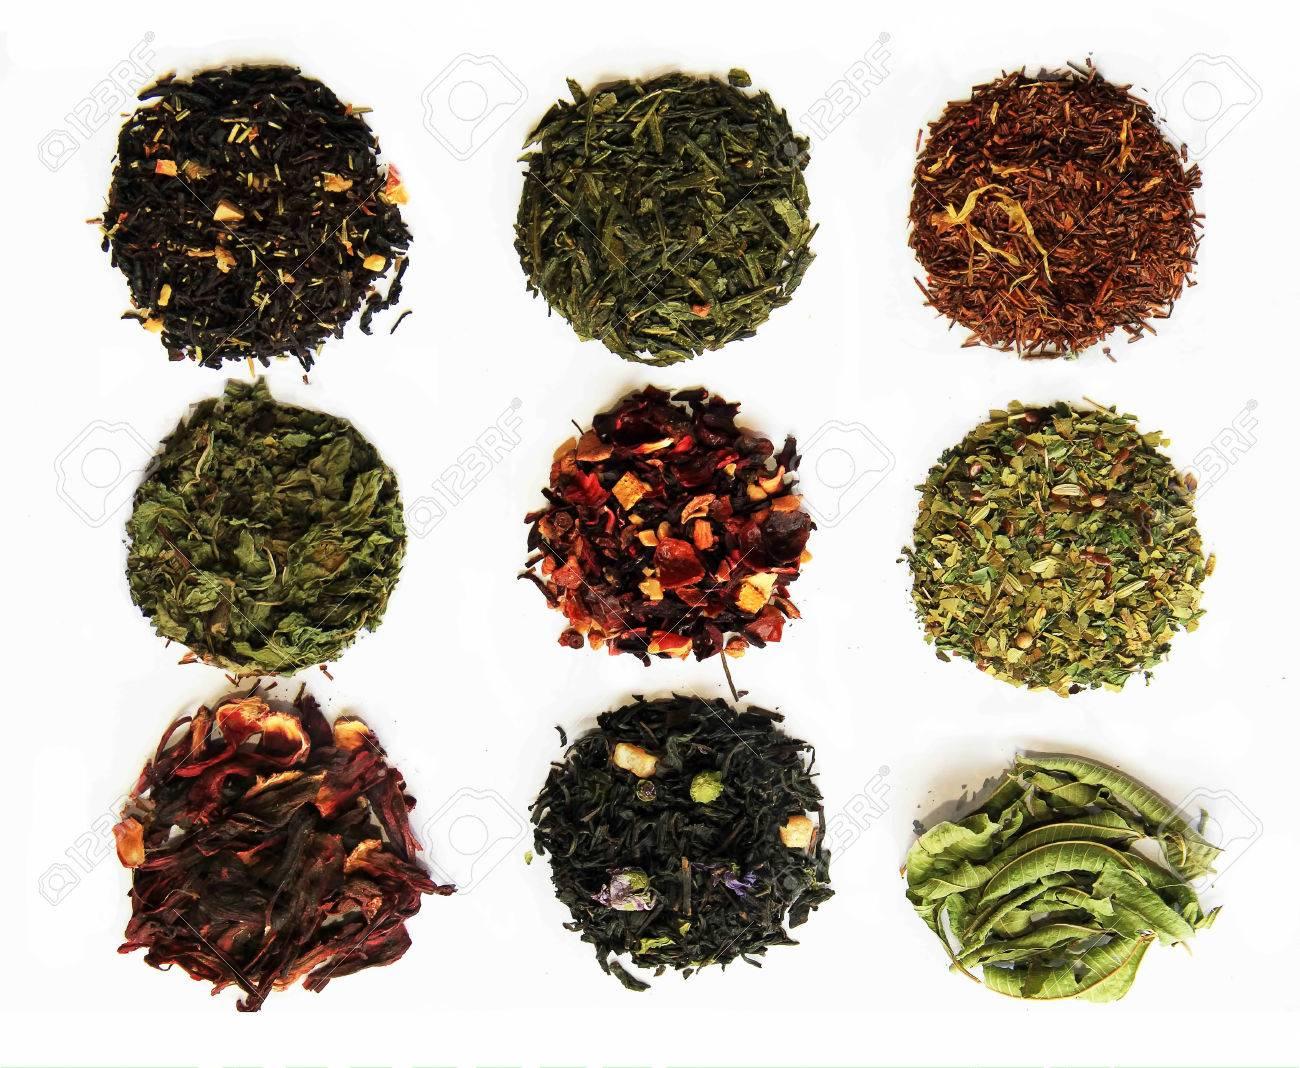 Atemberaubend Zusammensetzung Der Neun Tees (grün, Schwarz, Kräuter-, Blumen-Tee &LY_12